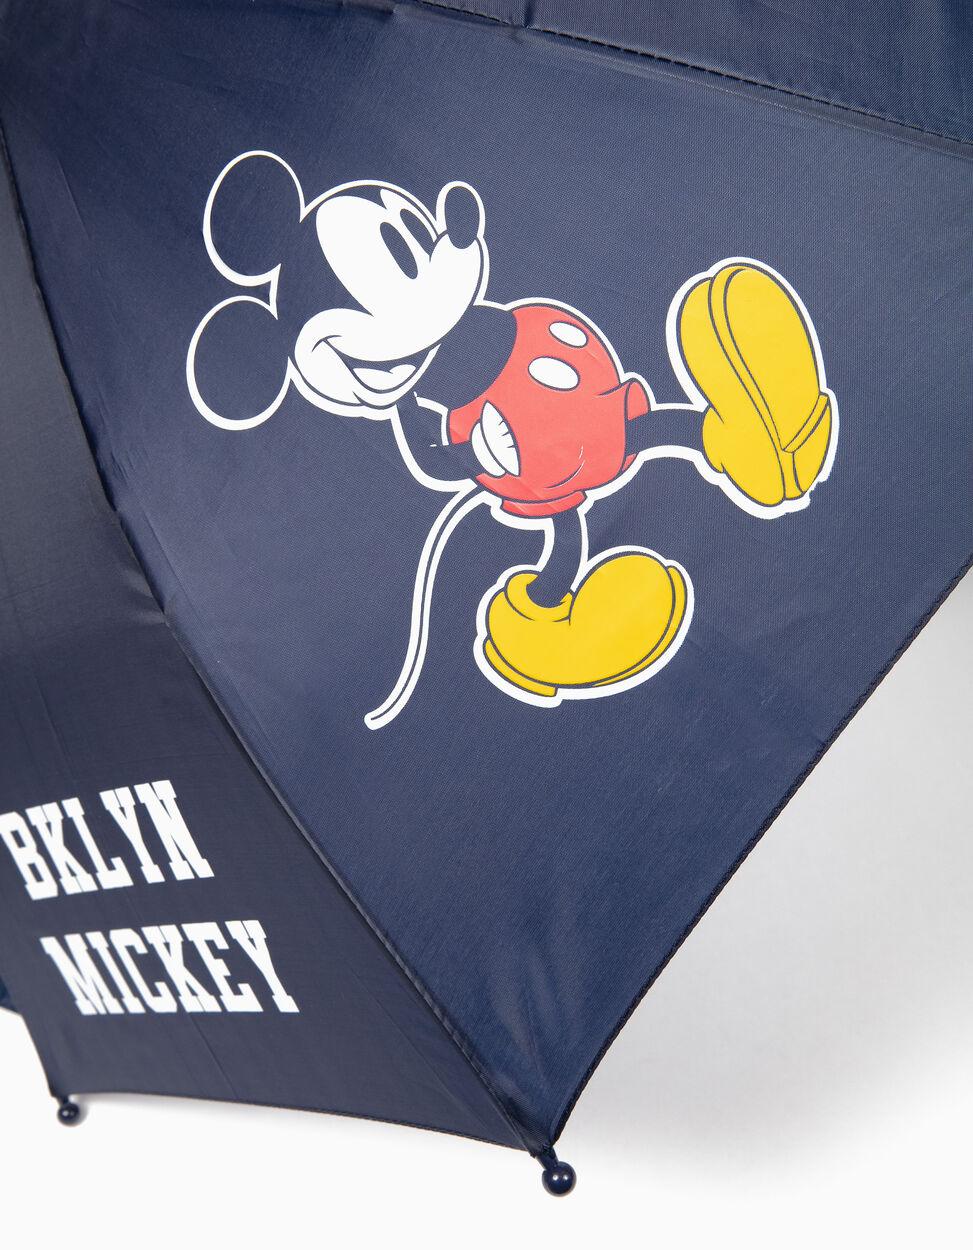 Guarda-Chuva BKLYN Mickey